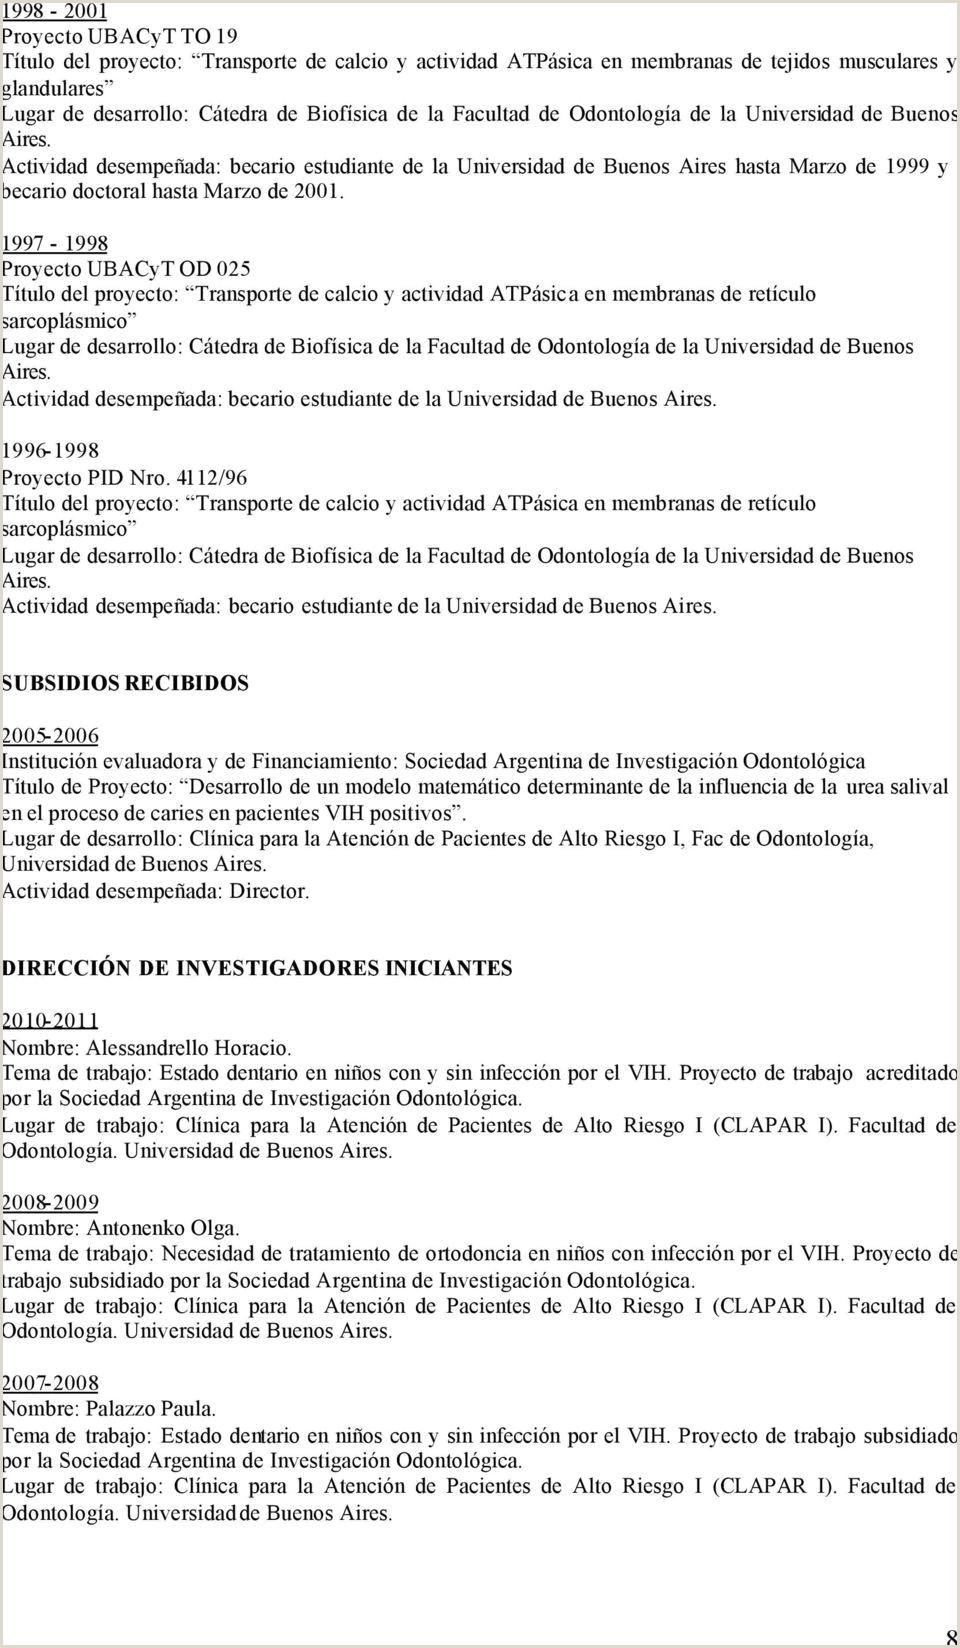 Curriculum Vitae Formato Word Para Llenar Proyectos Que